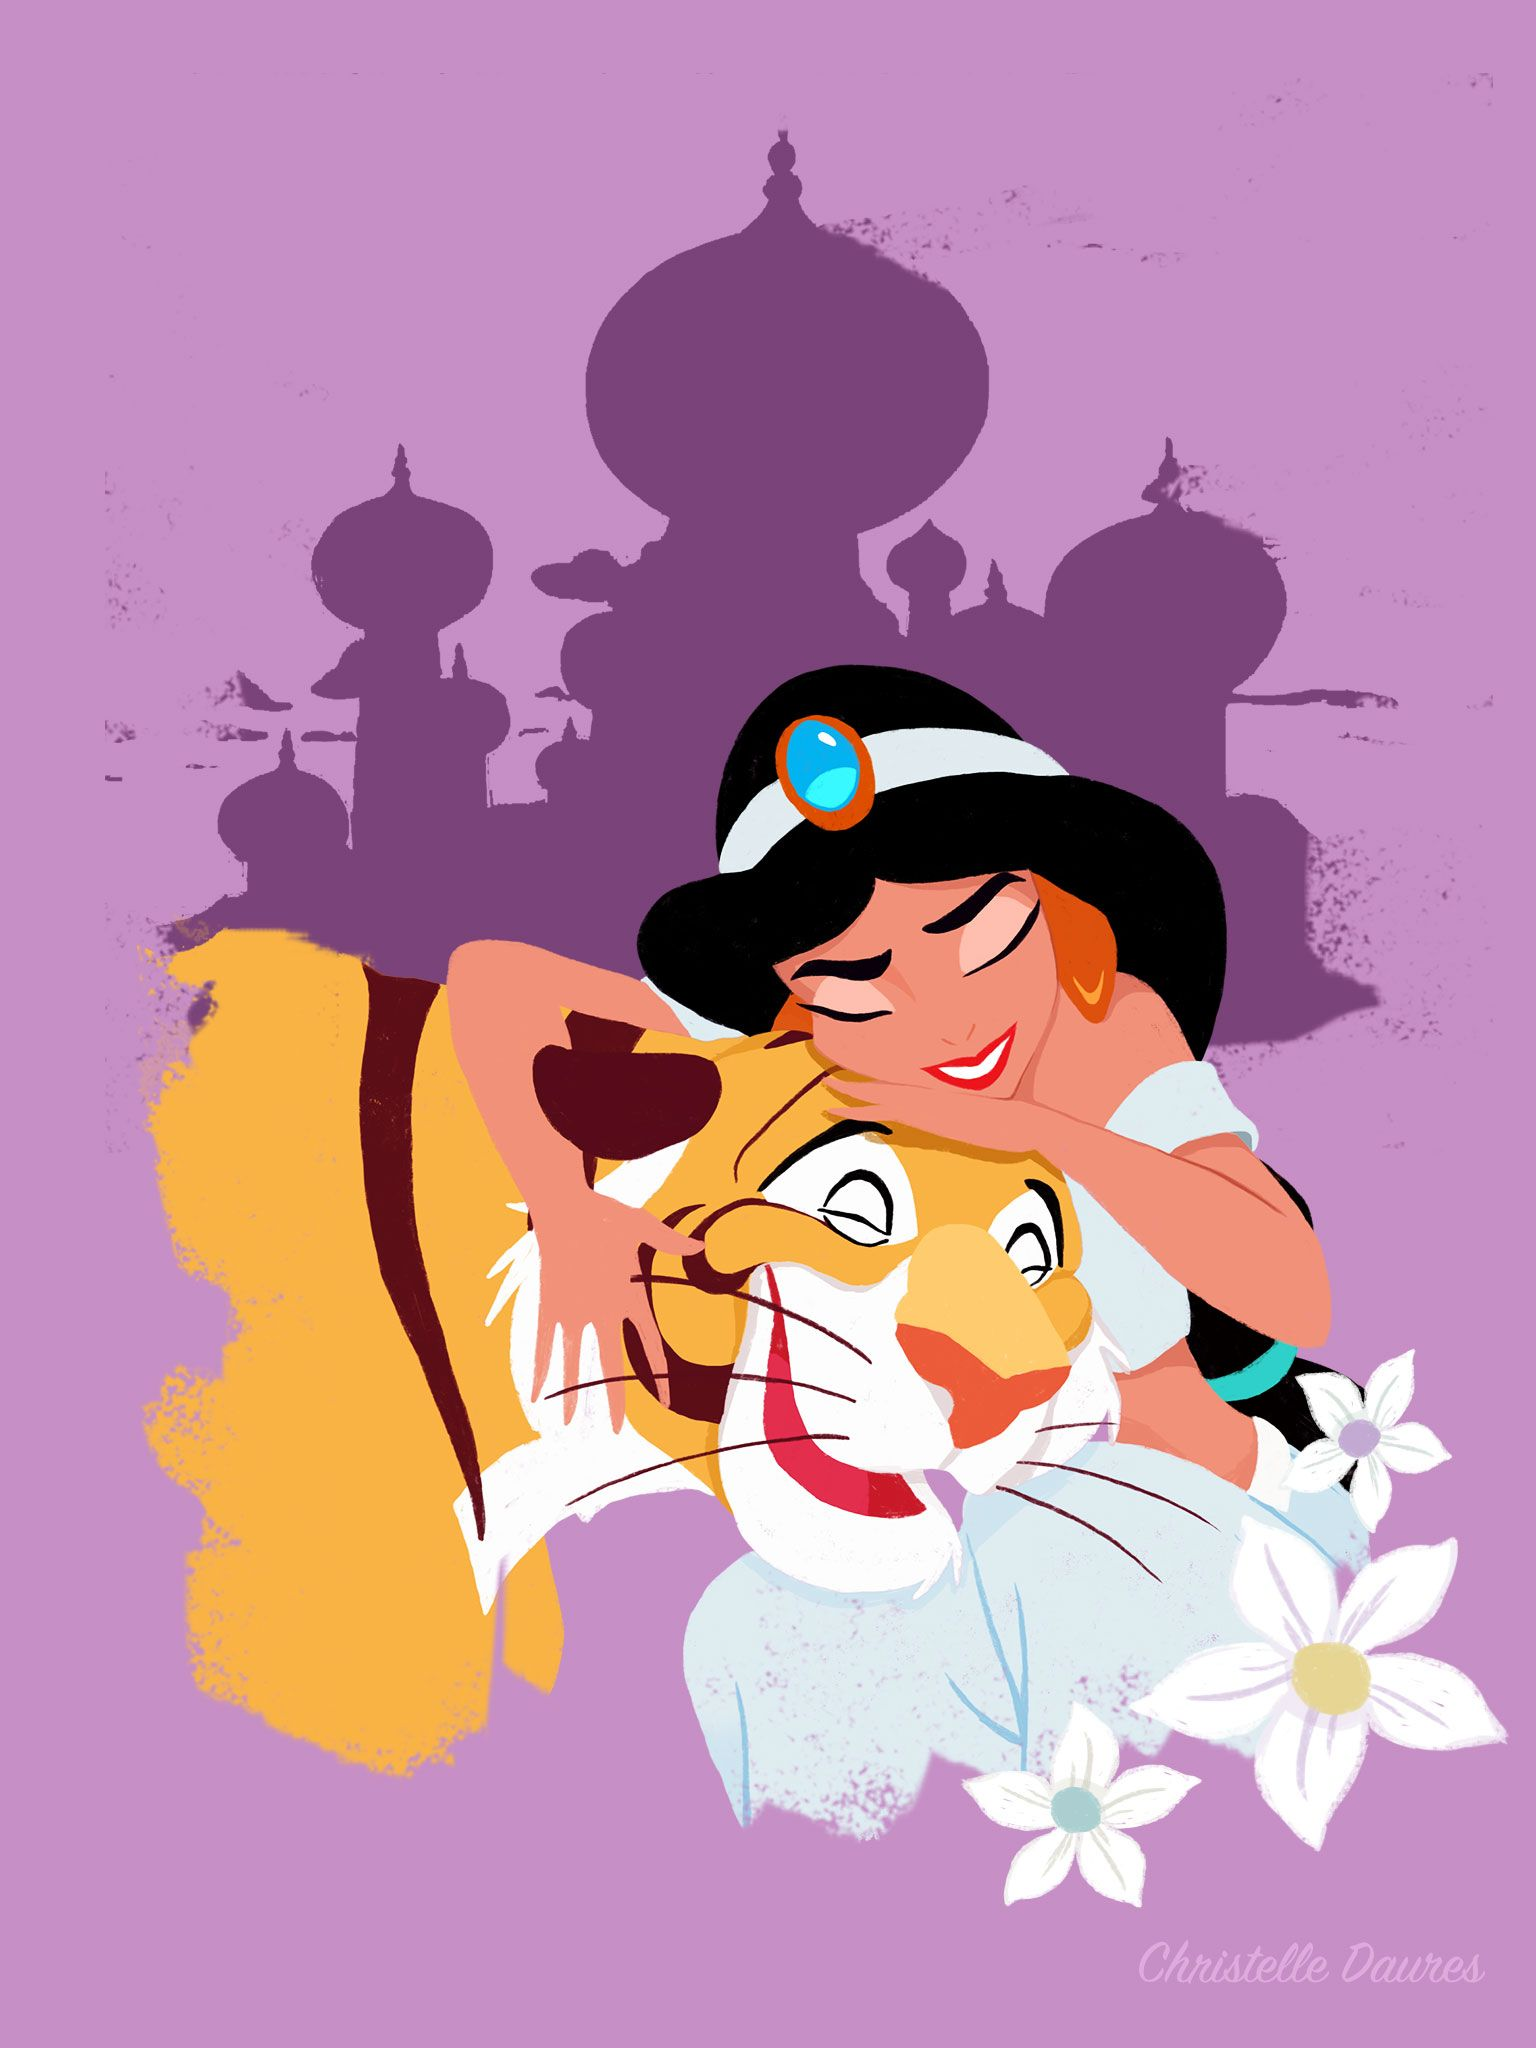 Fonds d'écran Disney Aladdin - Crecre | Disney mignon, Art disney et Art aladdin